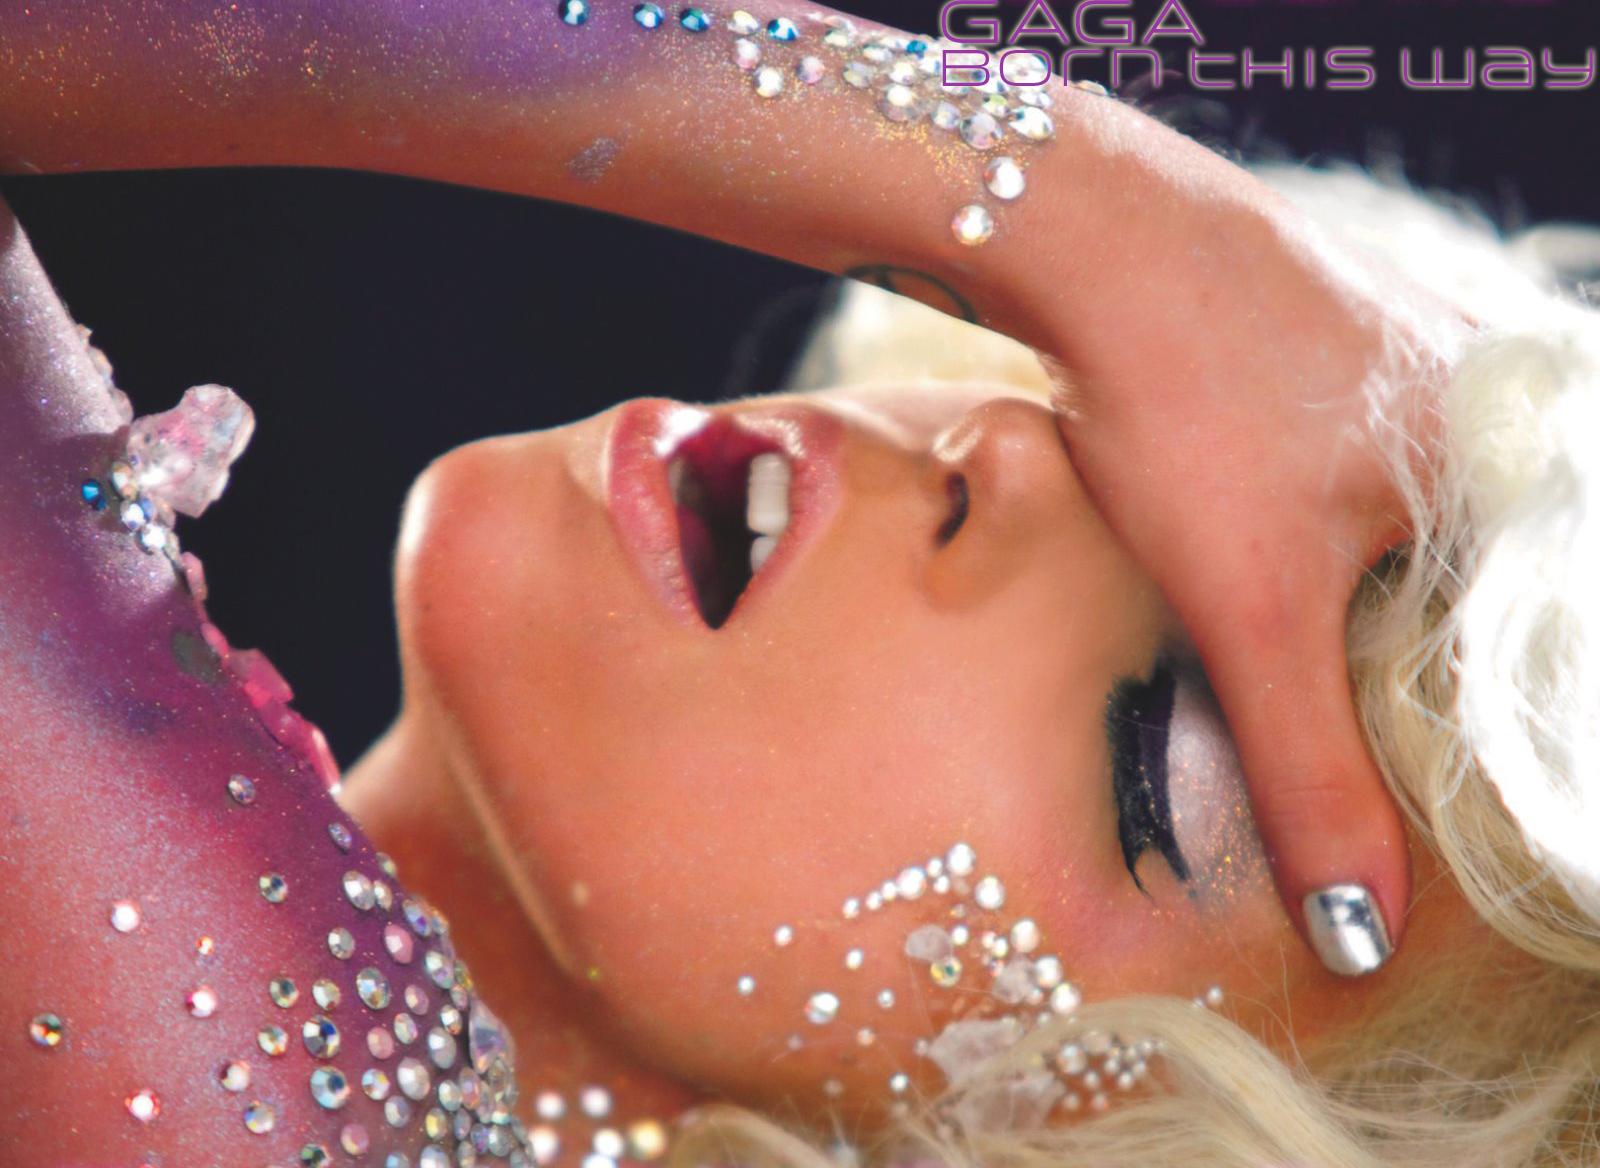 http://3.bp.blogspot.com/_p3HYu84mLSo/TPOdT9e5fgI/AAAAAAAAAZE/Su3j-f6Nkm8/s1600/Lady_Gaga_LoveGame+copia.jpg